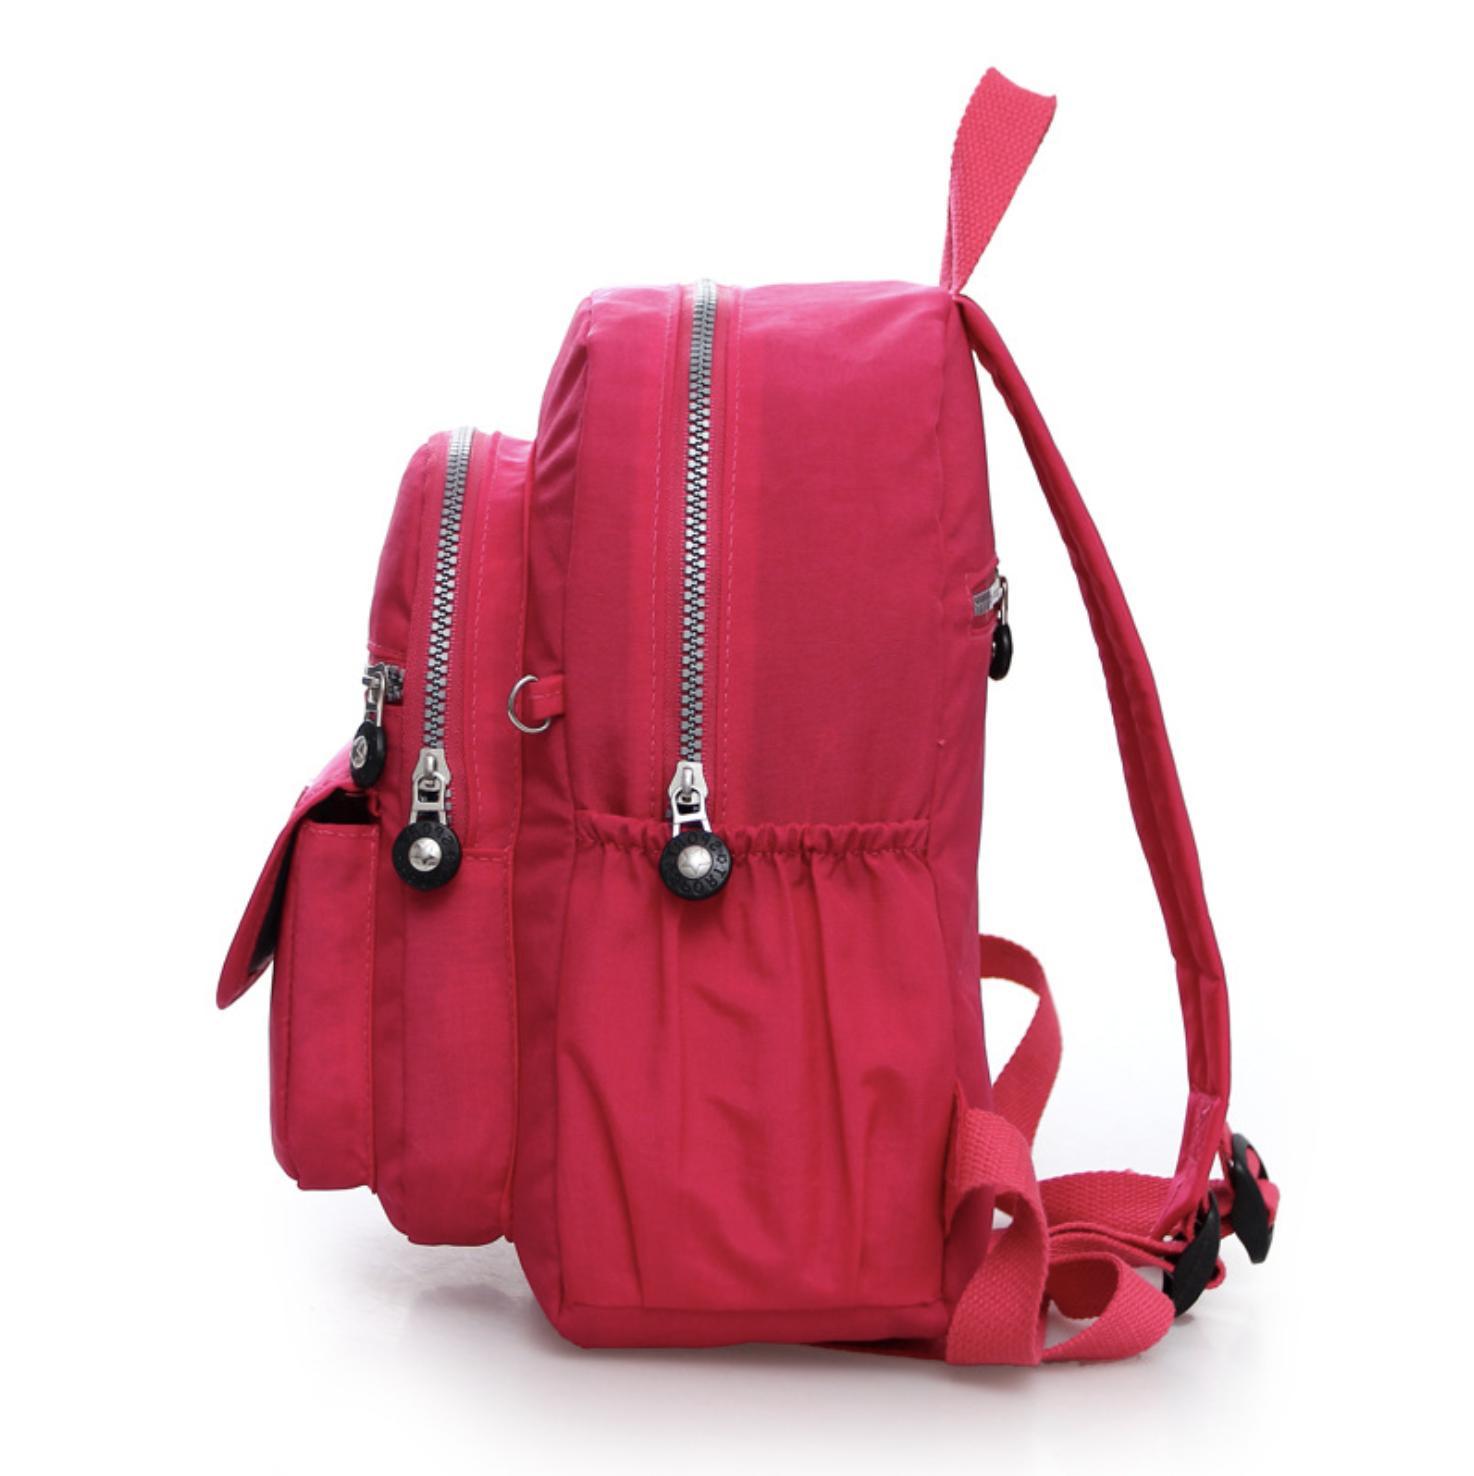 Waterproof Mini Purse Small Bag